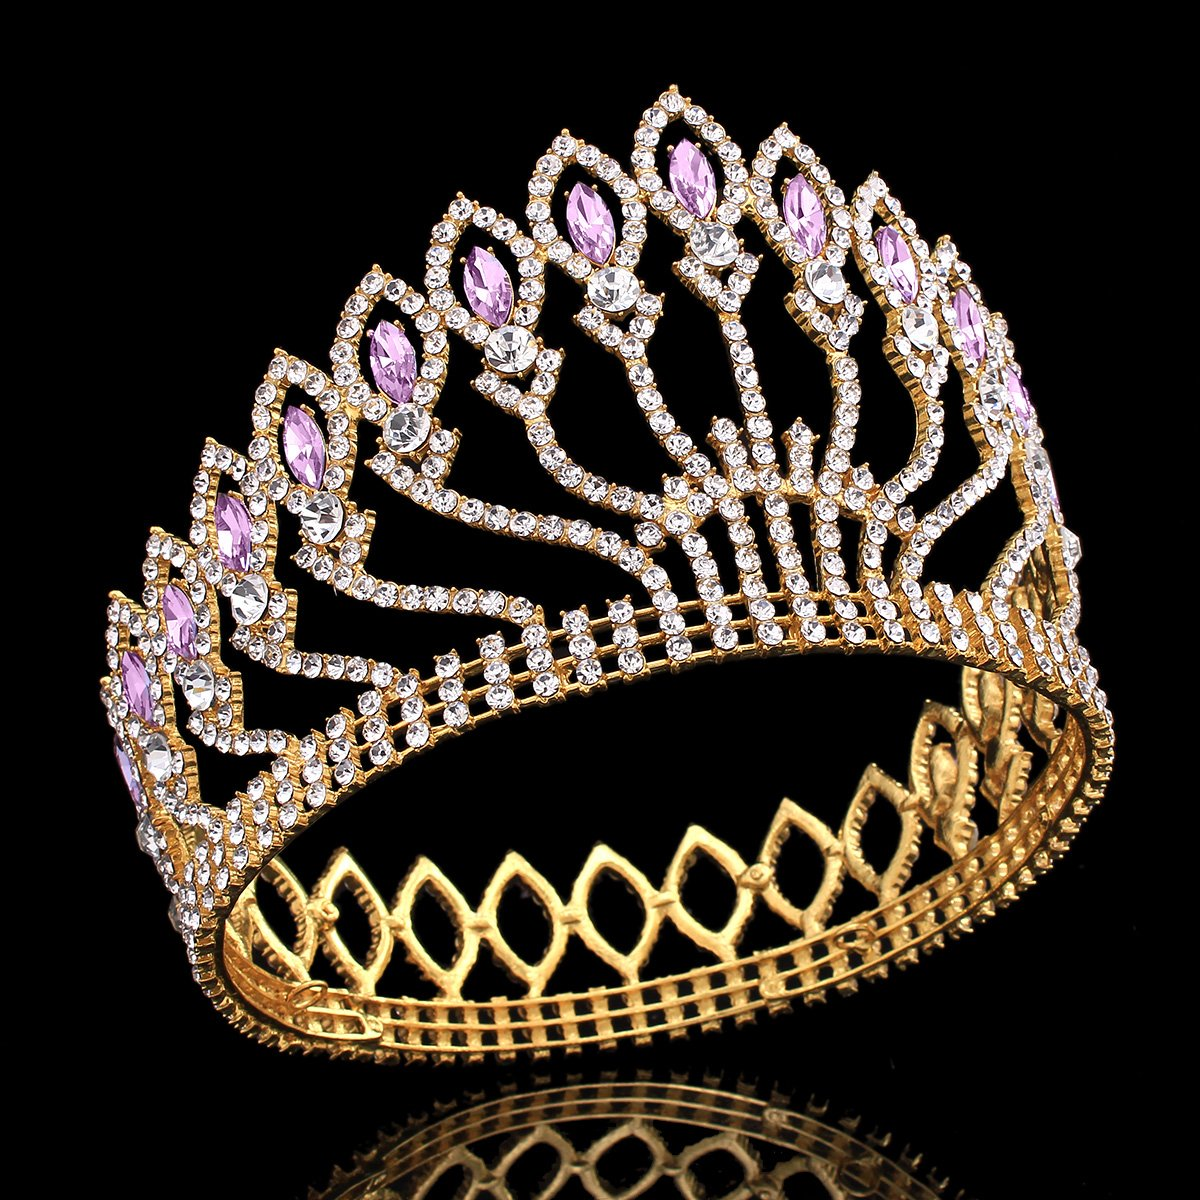 Stuffwholesale Marquise Crystal Crown Women Girl Queen Tiara Banquet Party Headwear